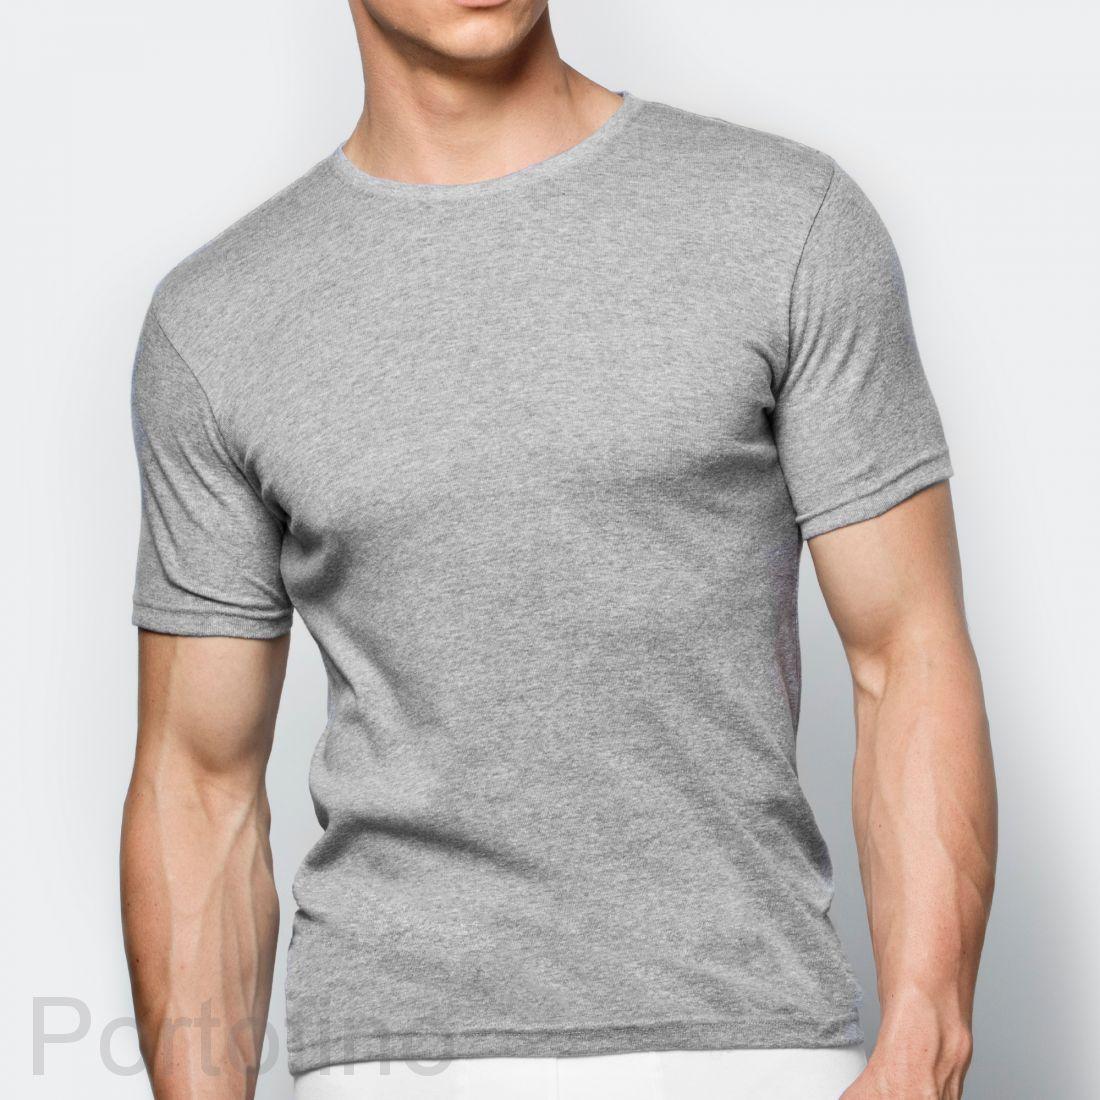 BMV-048 Мужская футболка Atlantic